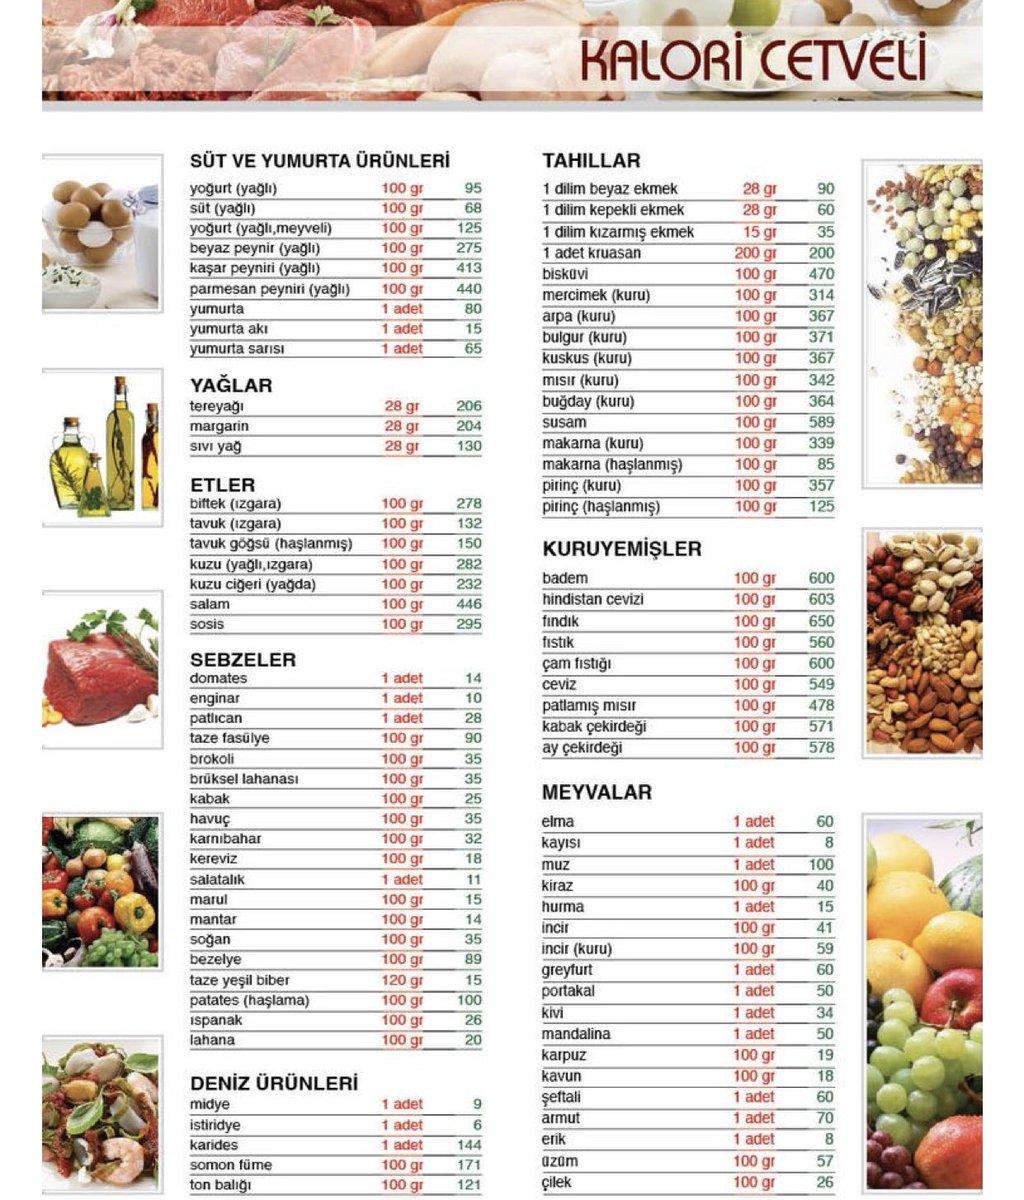 Kalori Cetveli